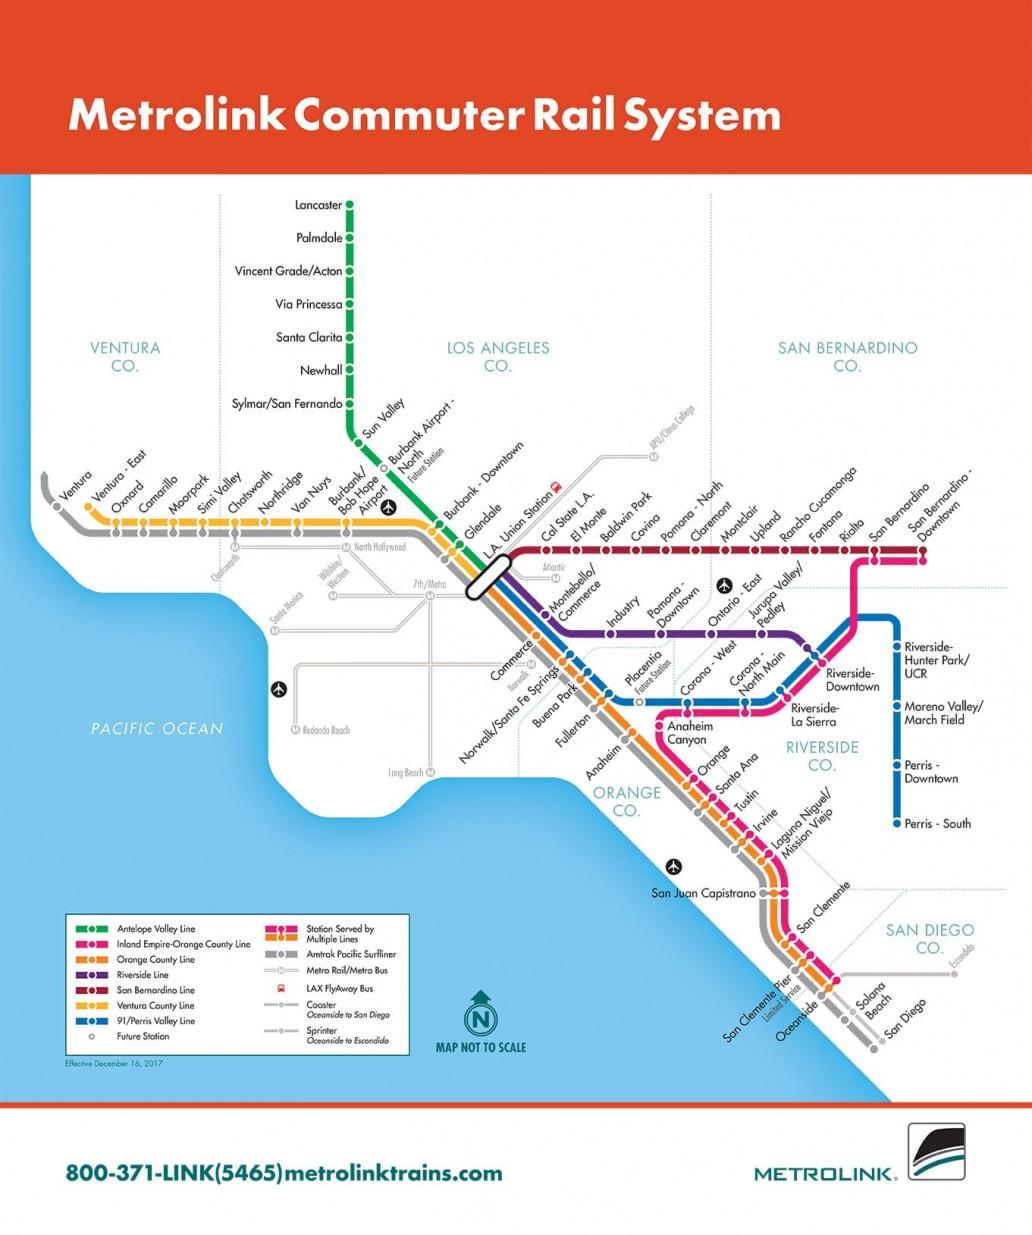 RCTC Metrolink System Map